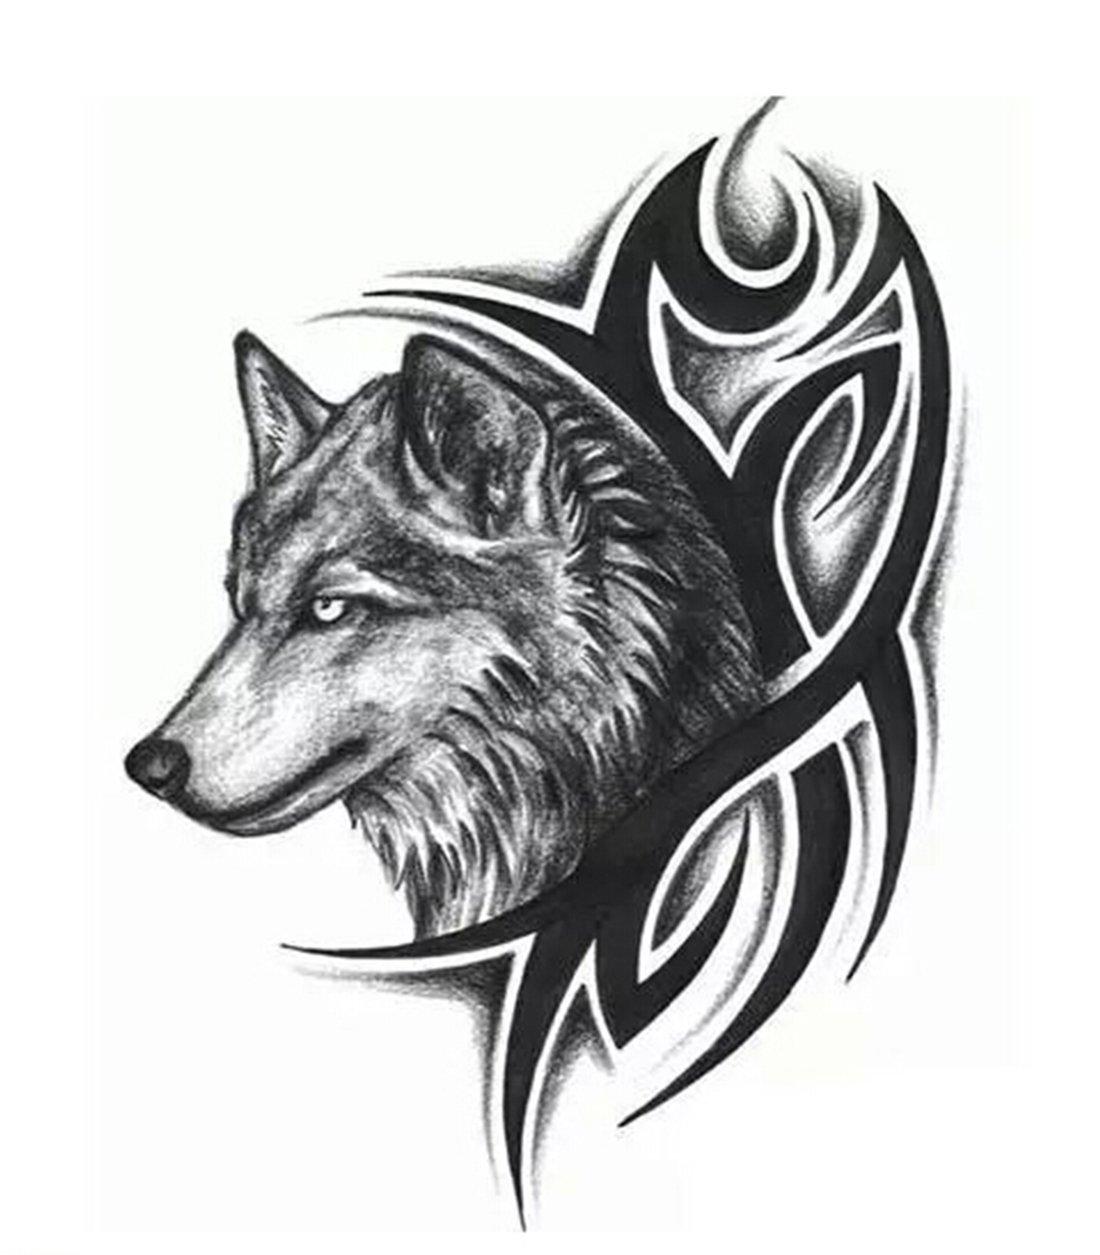 Temporary tattoo for girls men women 3d wolf sticker size 19x12cm 1pc amazon in beauty